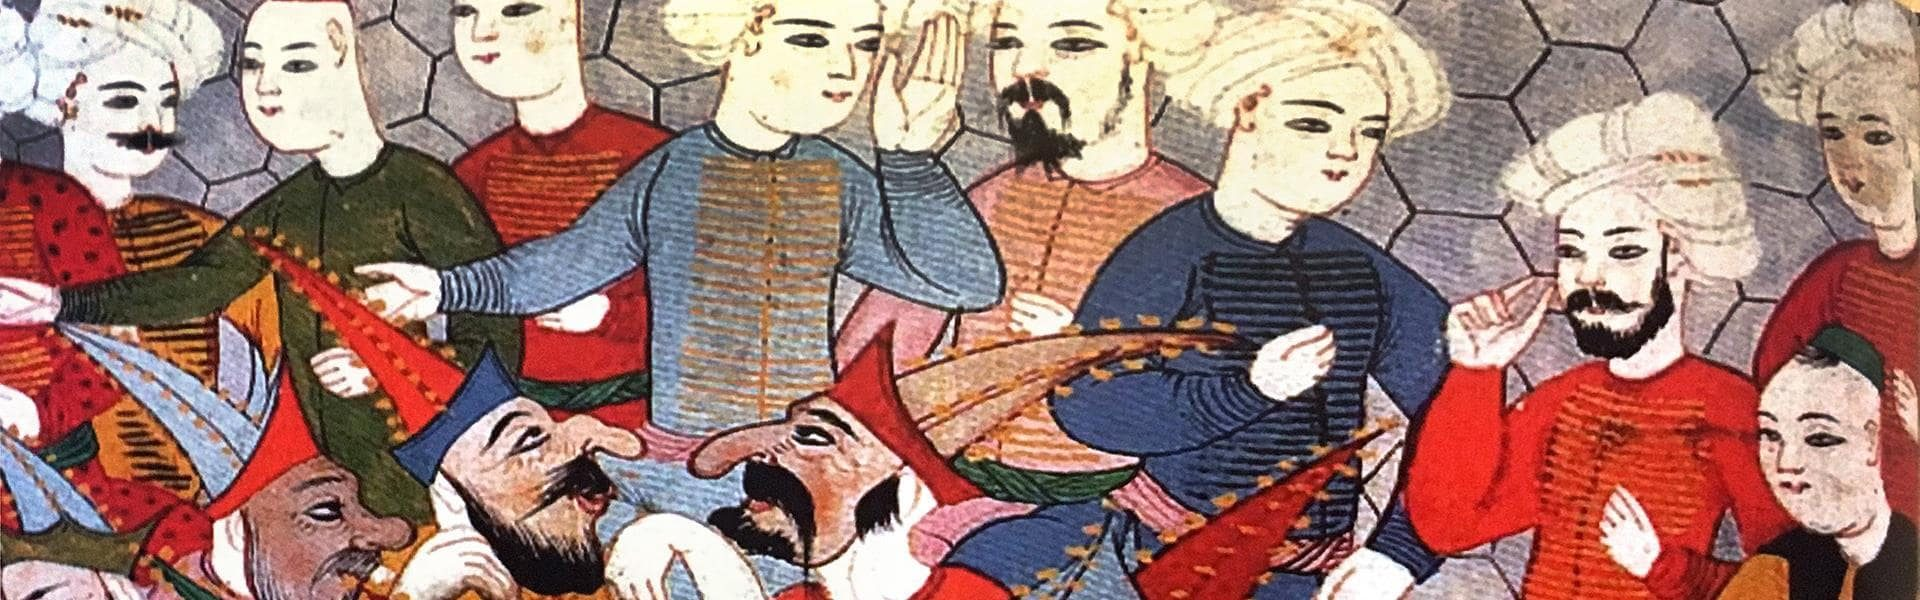 traditional-sohbet-hero-image